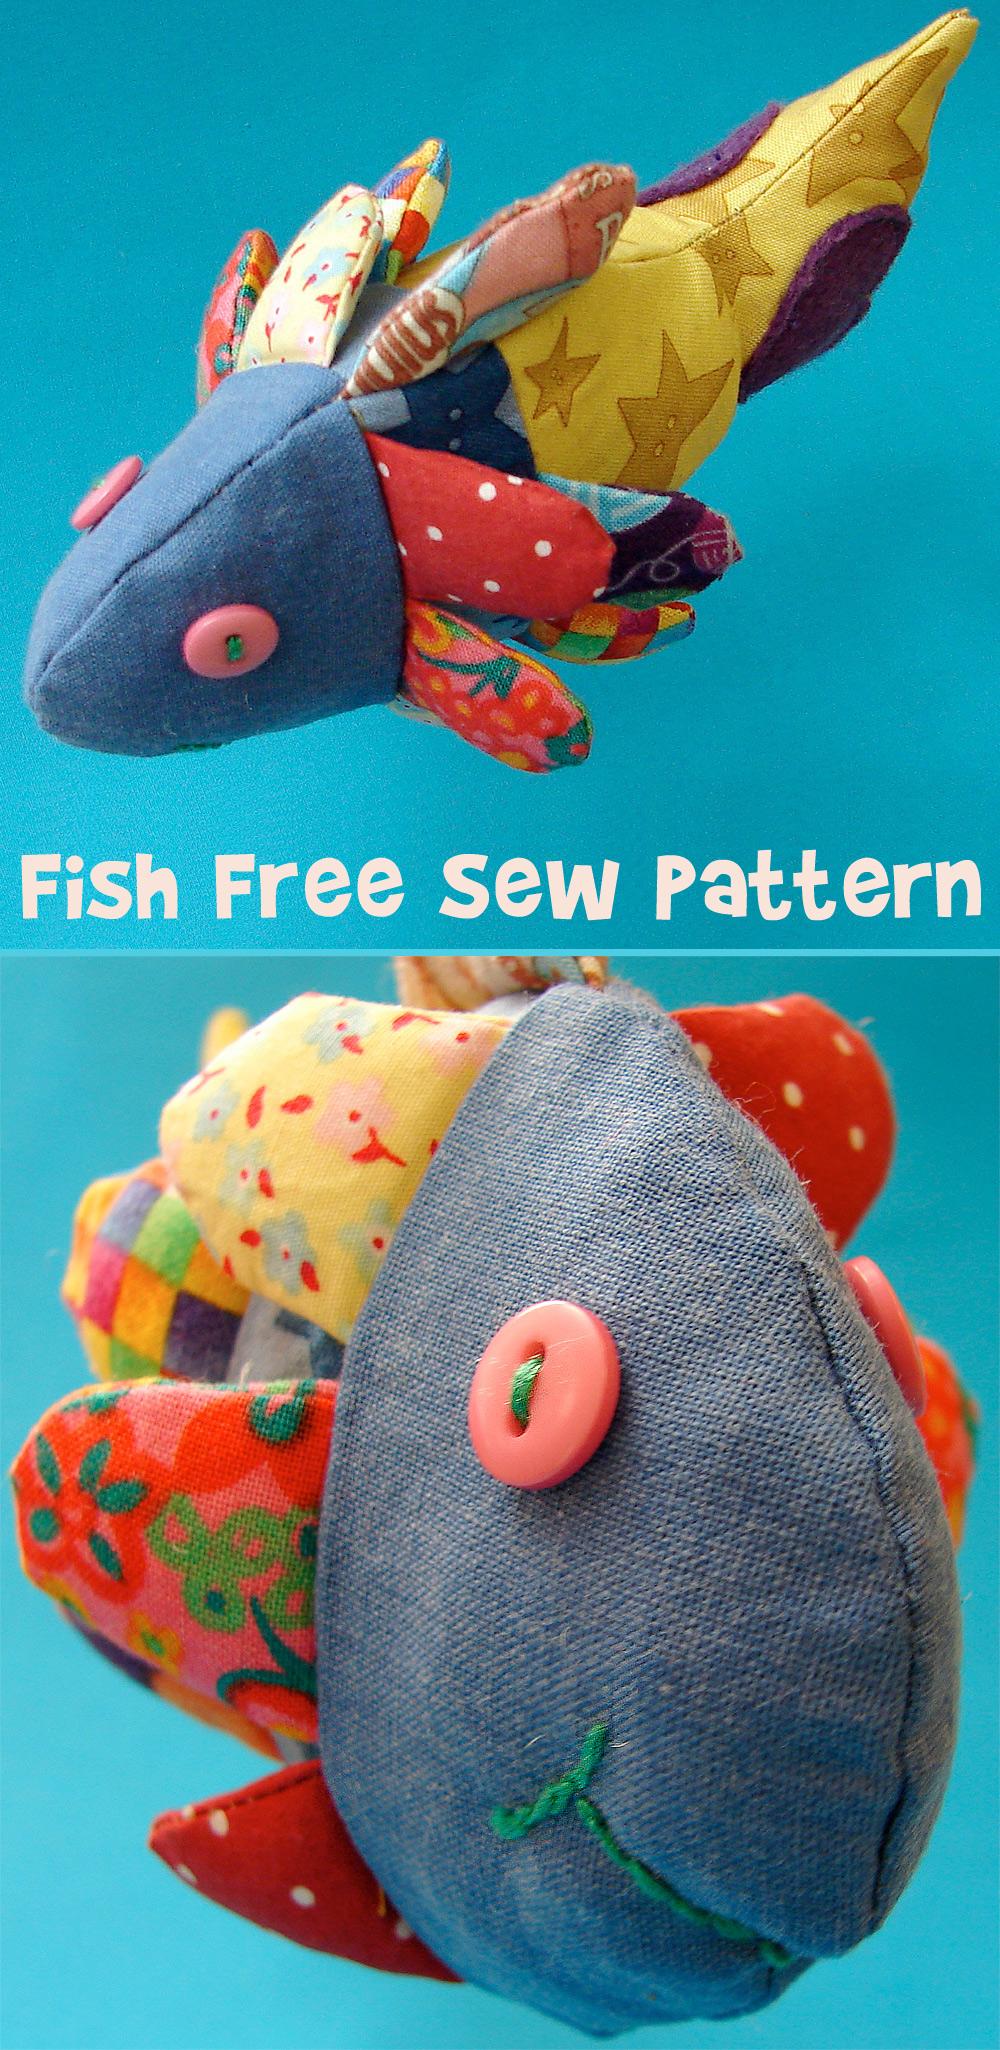 Fabric Toy Fish Free Sewing Pattern